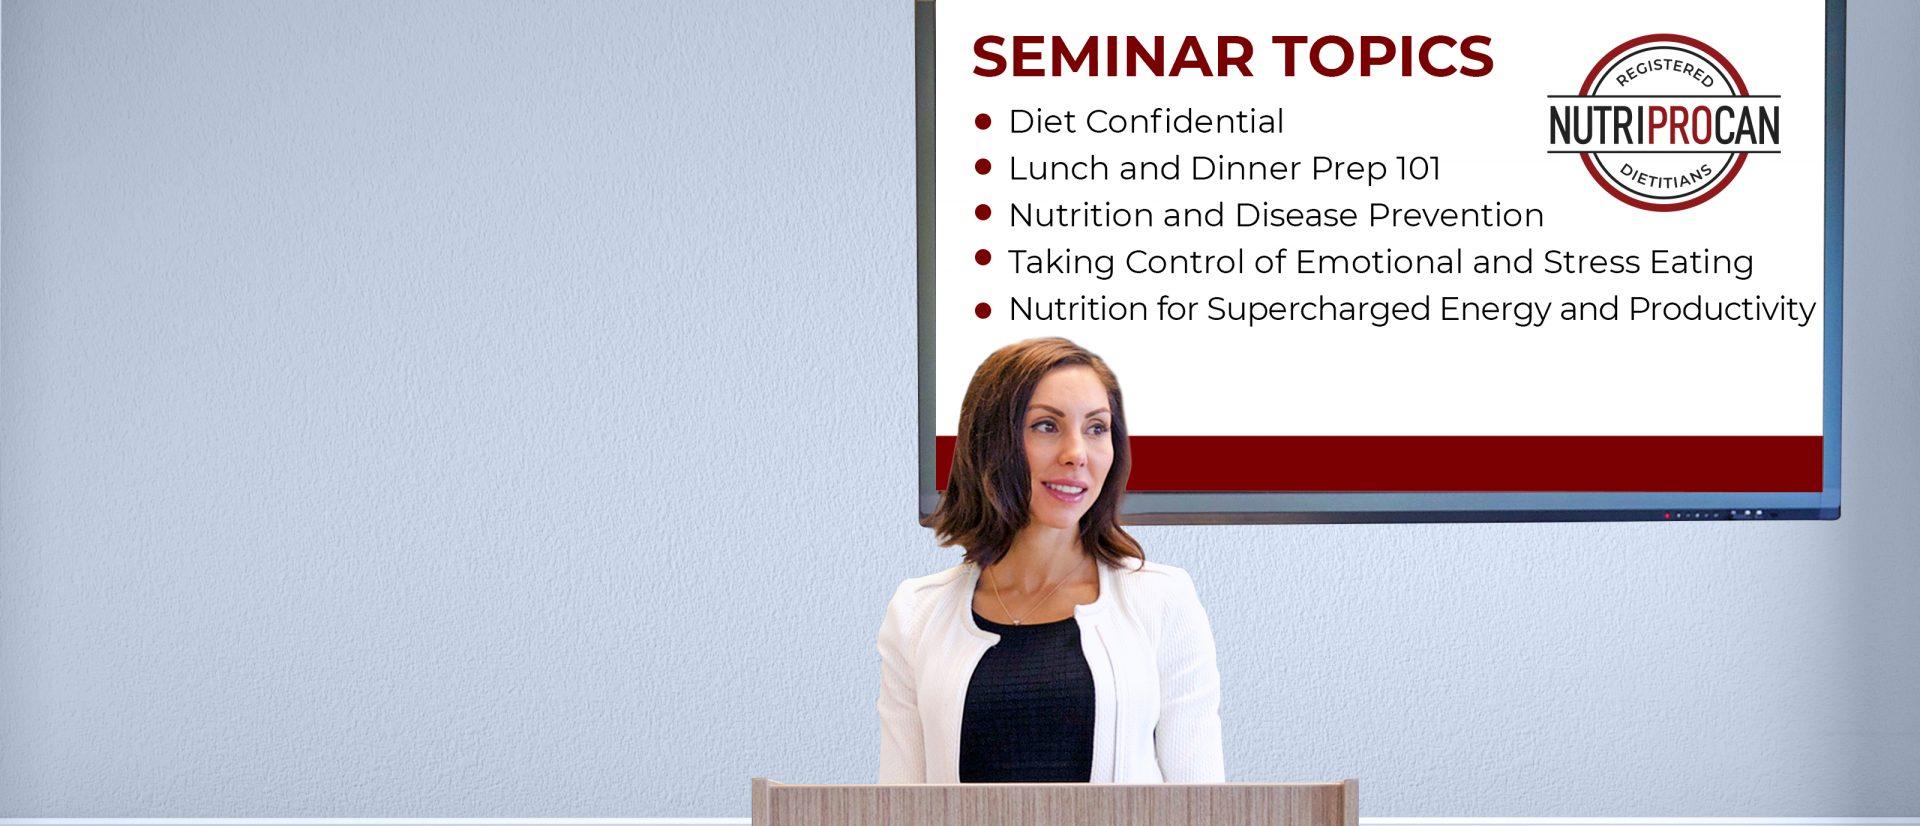 NutriProCan Wellness Seminars